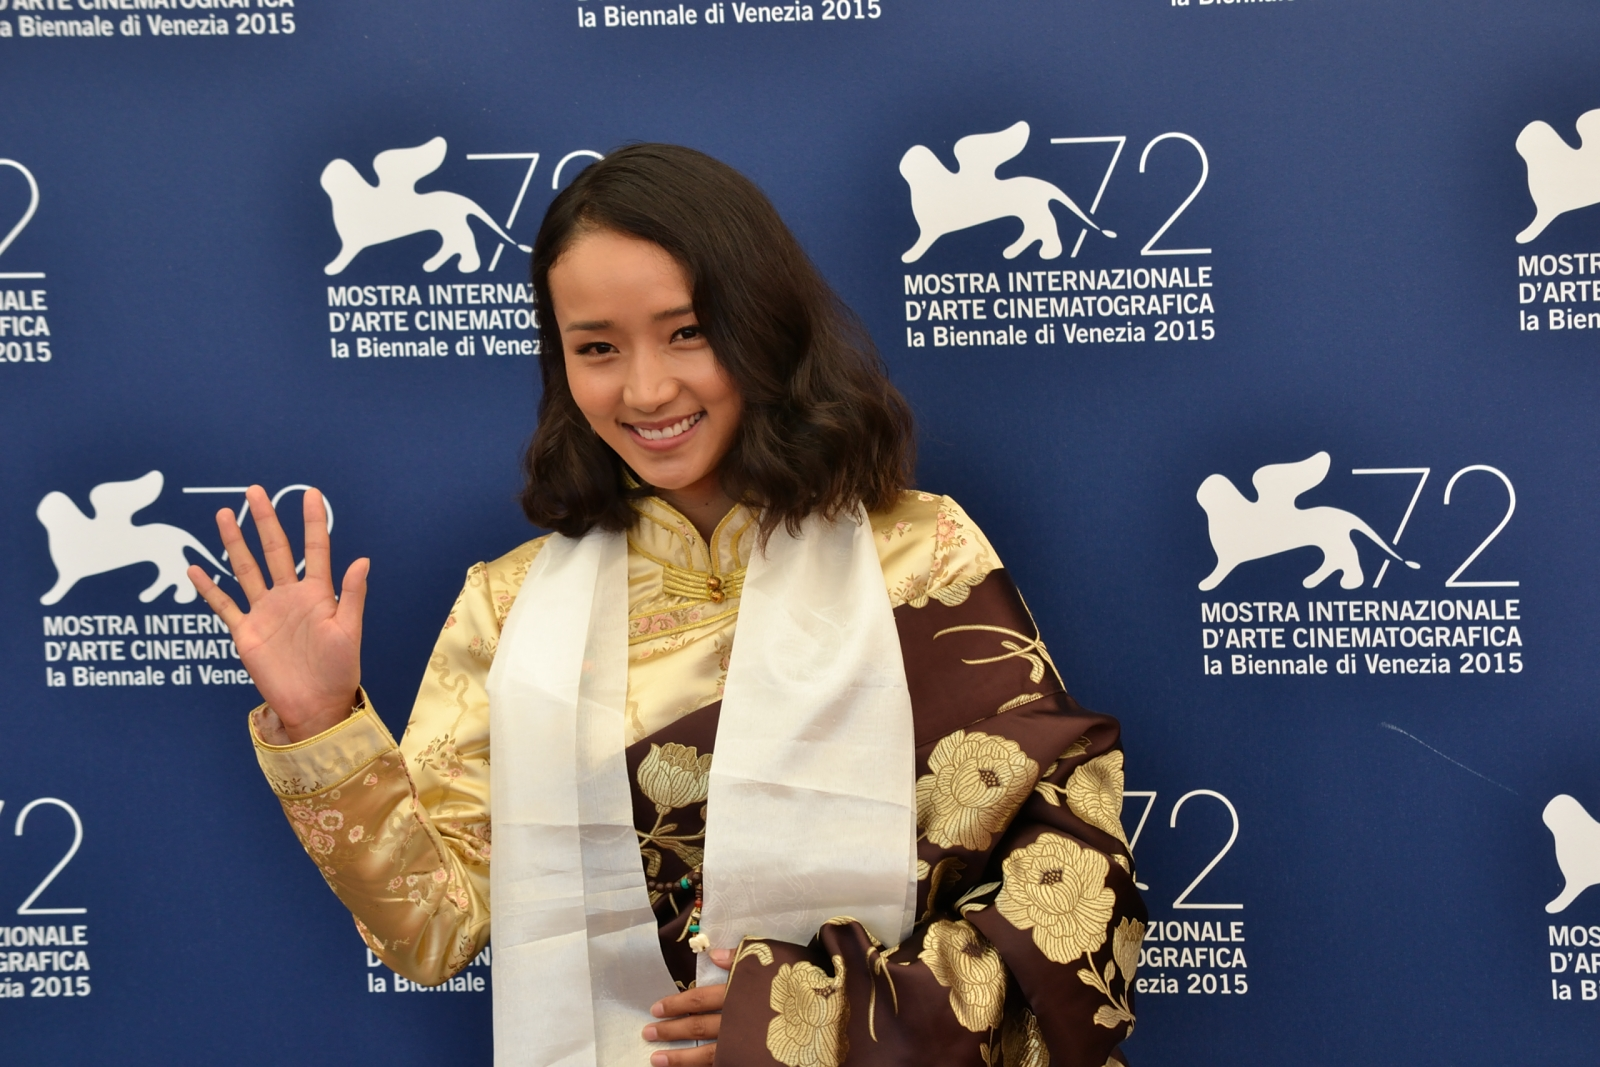 Venezia 2015: Yangshik Tso saluta i fotografi al photocall di Tharlo